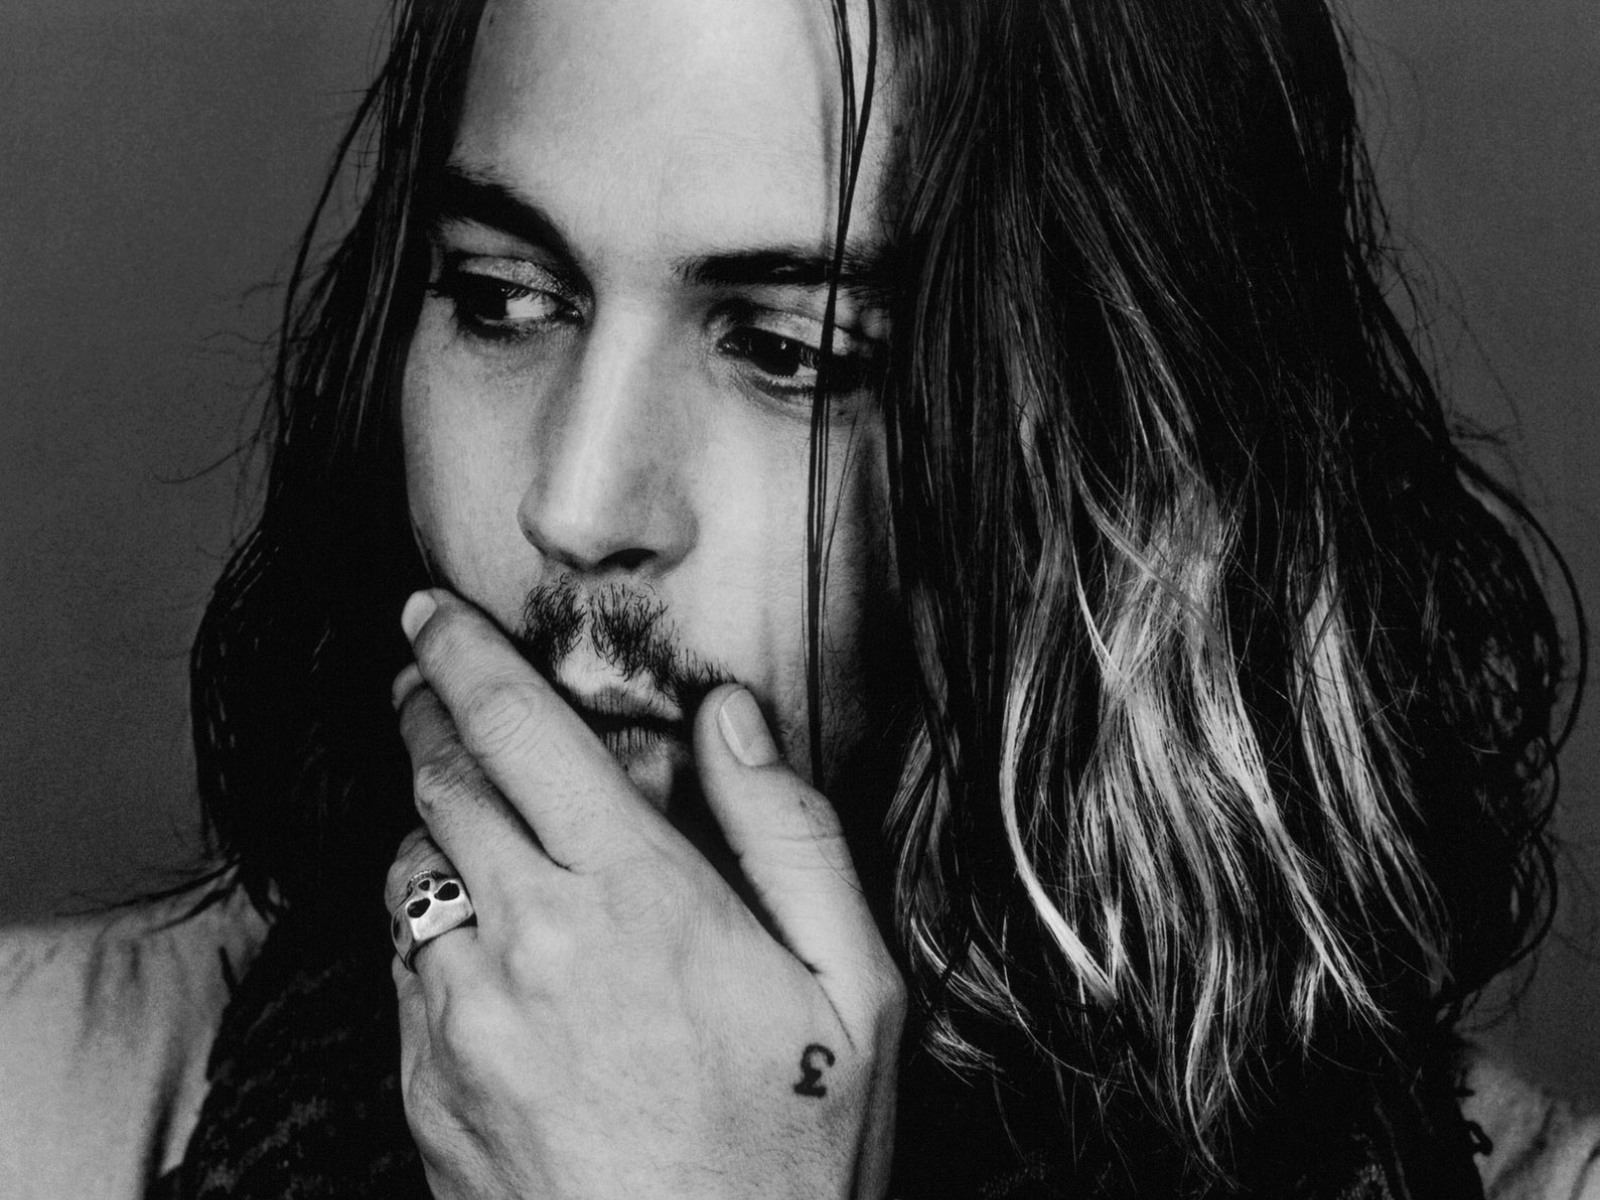 Johnny Depp Wallpapers 1600x1200